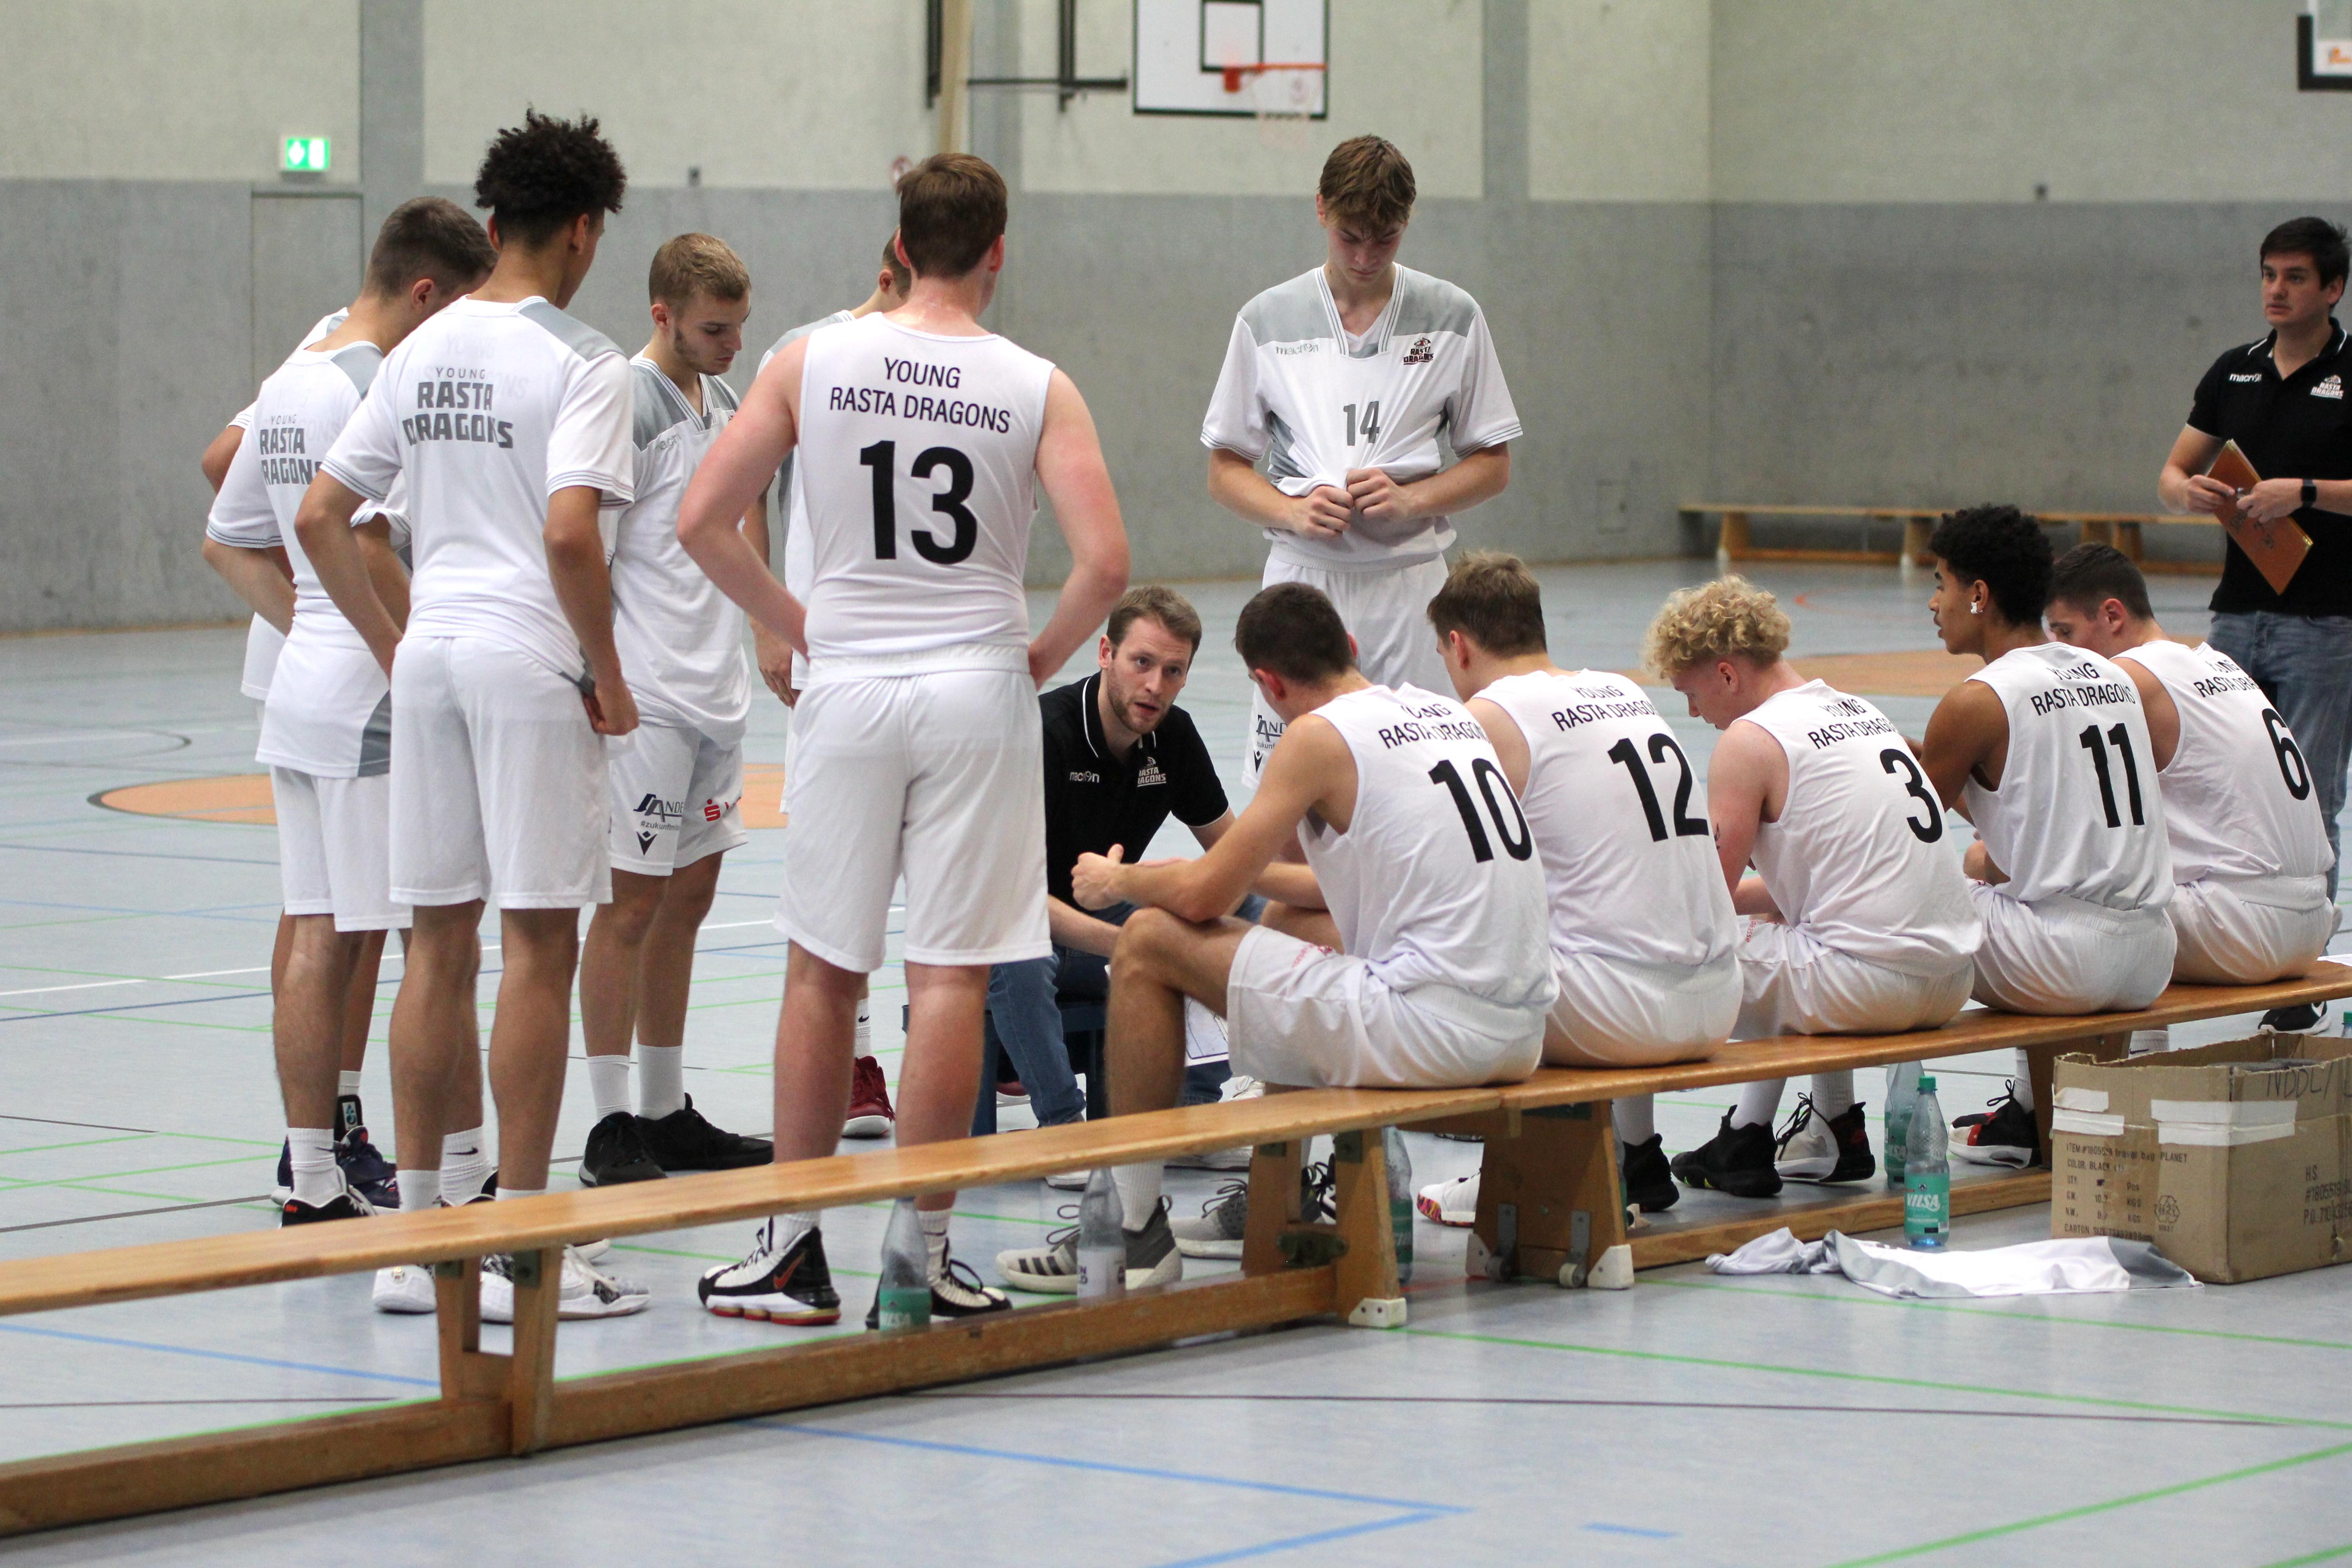 NBBL_20-21_YOUNG-RASTA-DRAGONS_Münster_Spieltag1_Marius-Graf_2